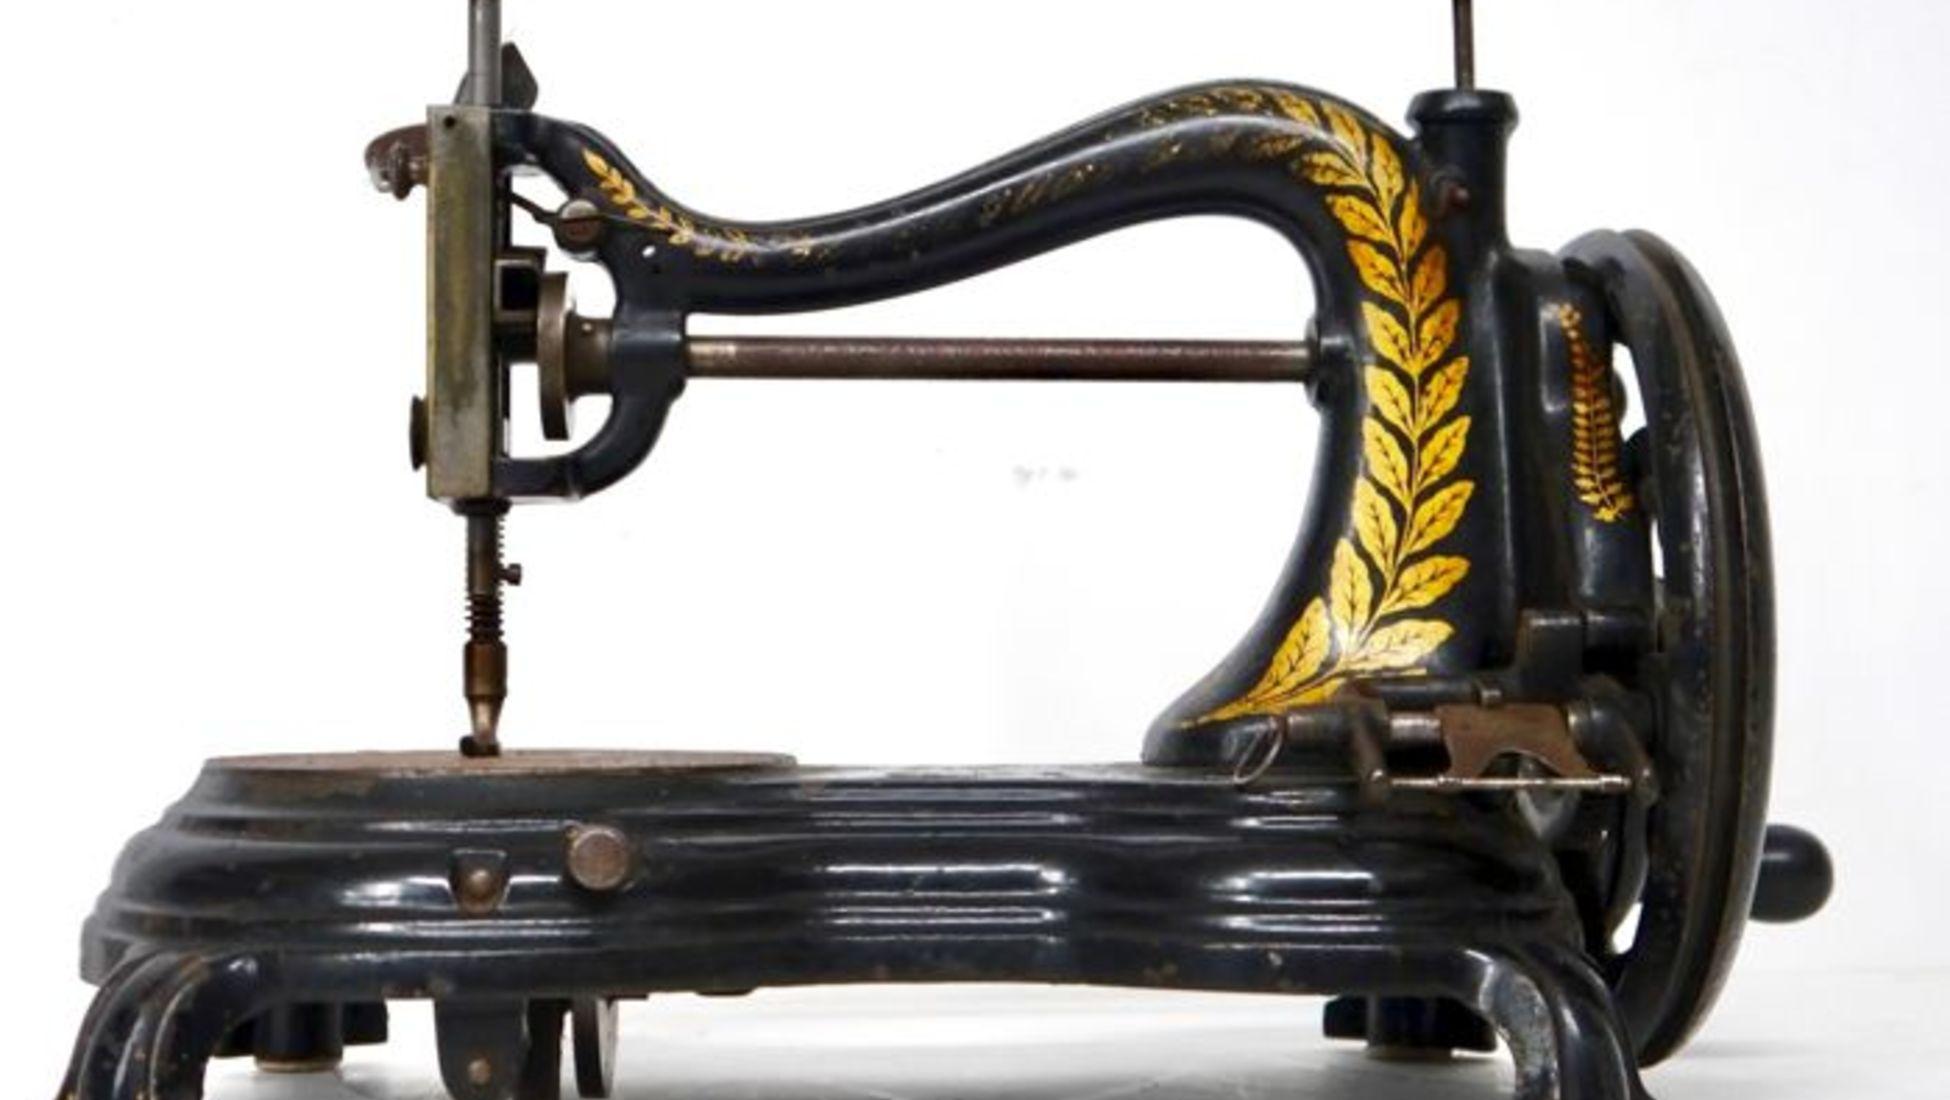 C mo determinar el valor de tu antigua m quina de coser for Macchine da cucire toyota prezzi